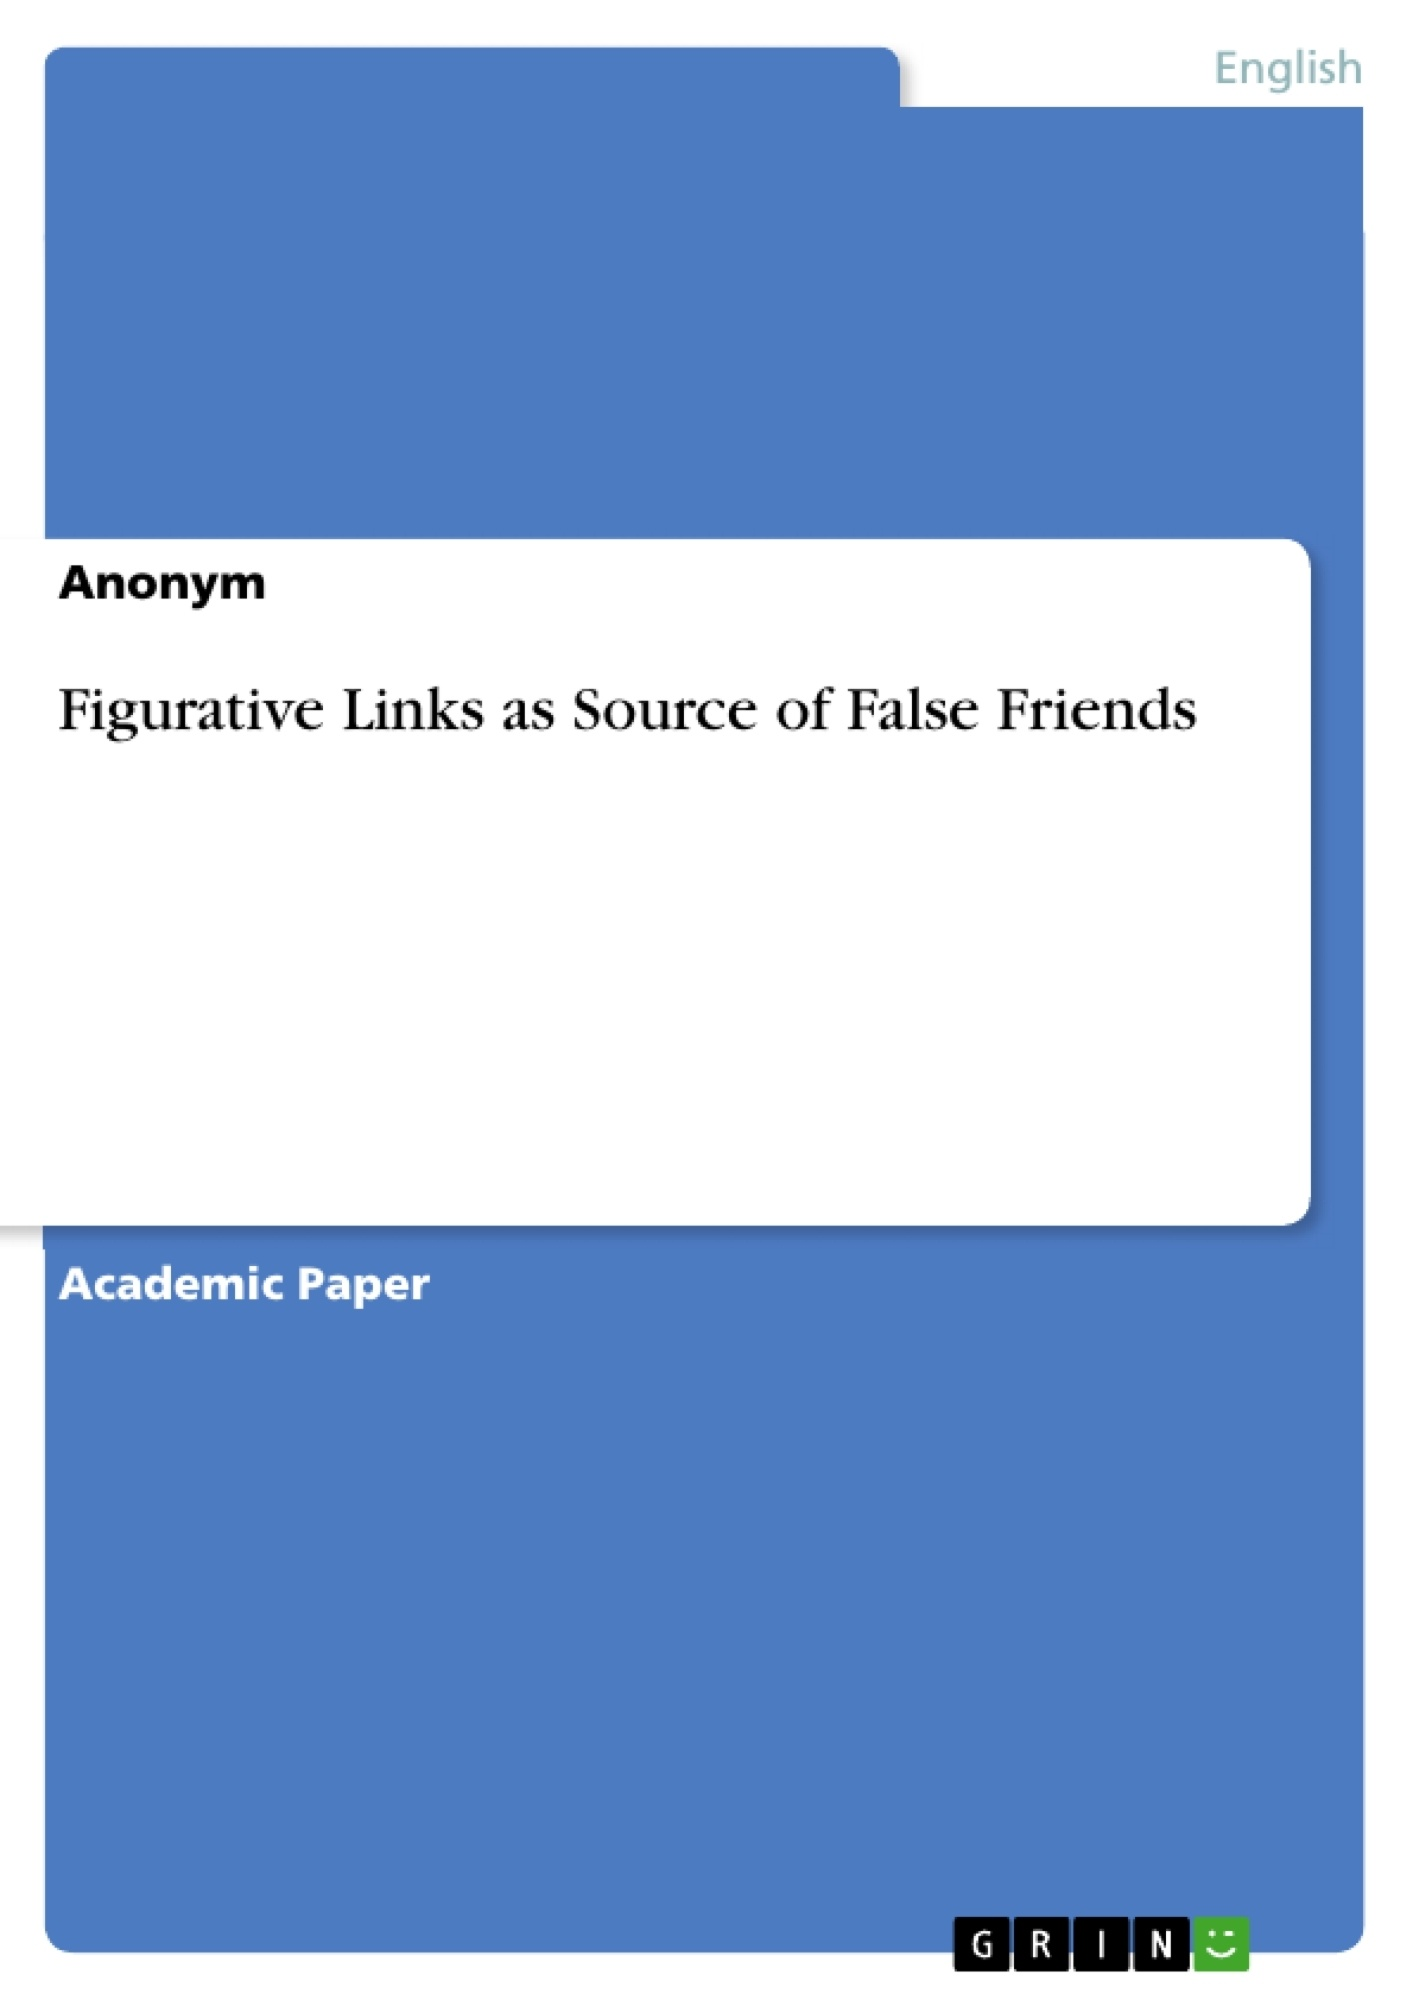 Title: Figurative Links as Source of False Friends